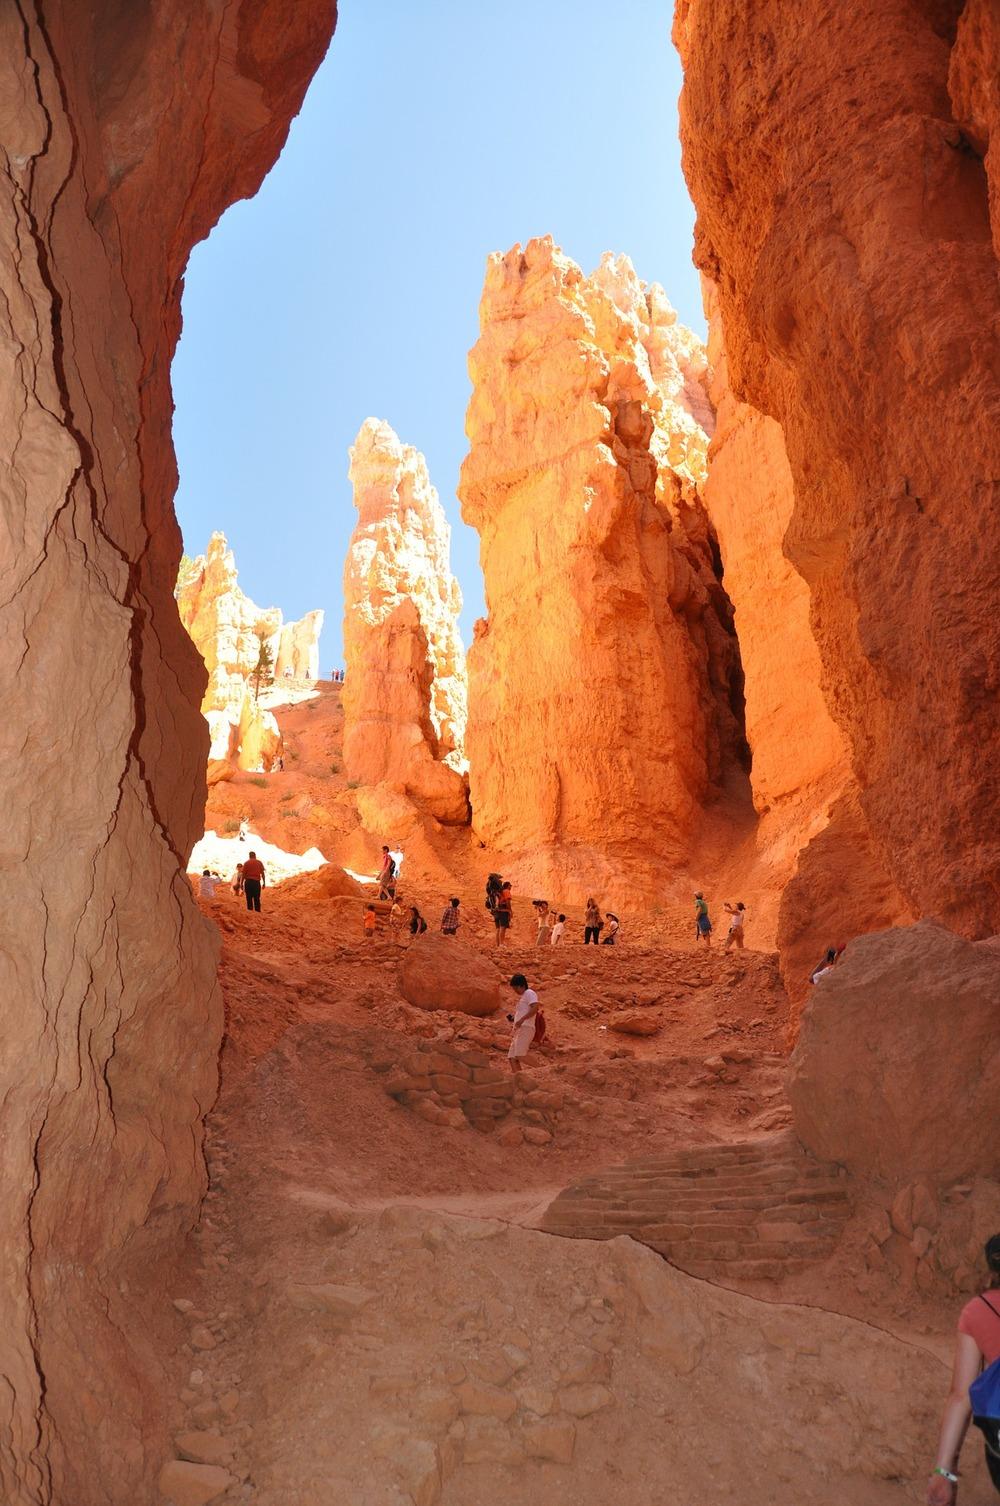 bryce-canyon-93107_1920.jpg